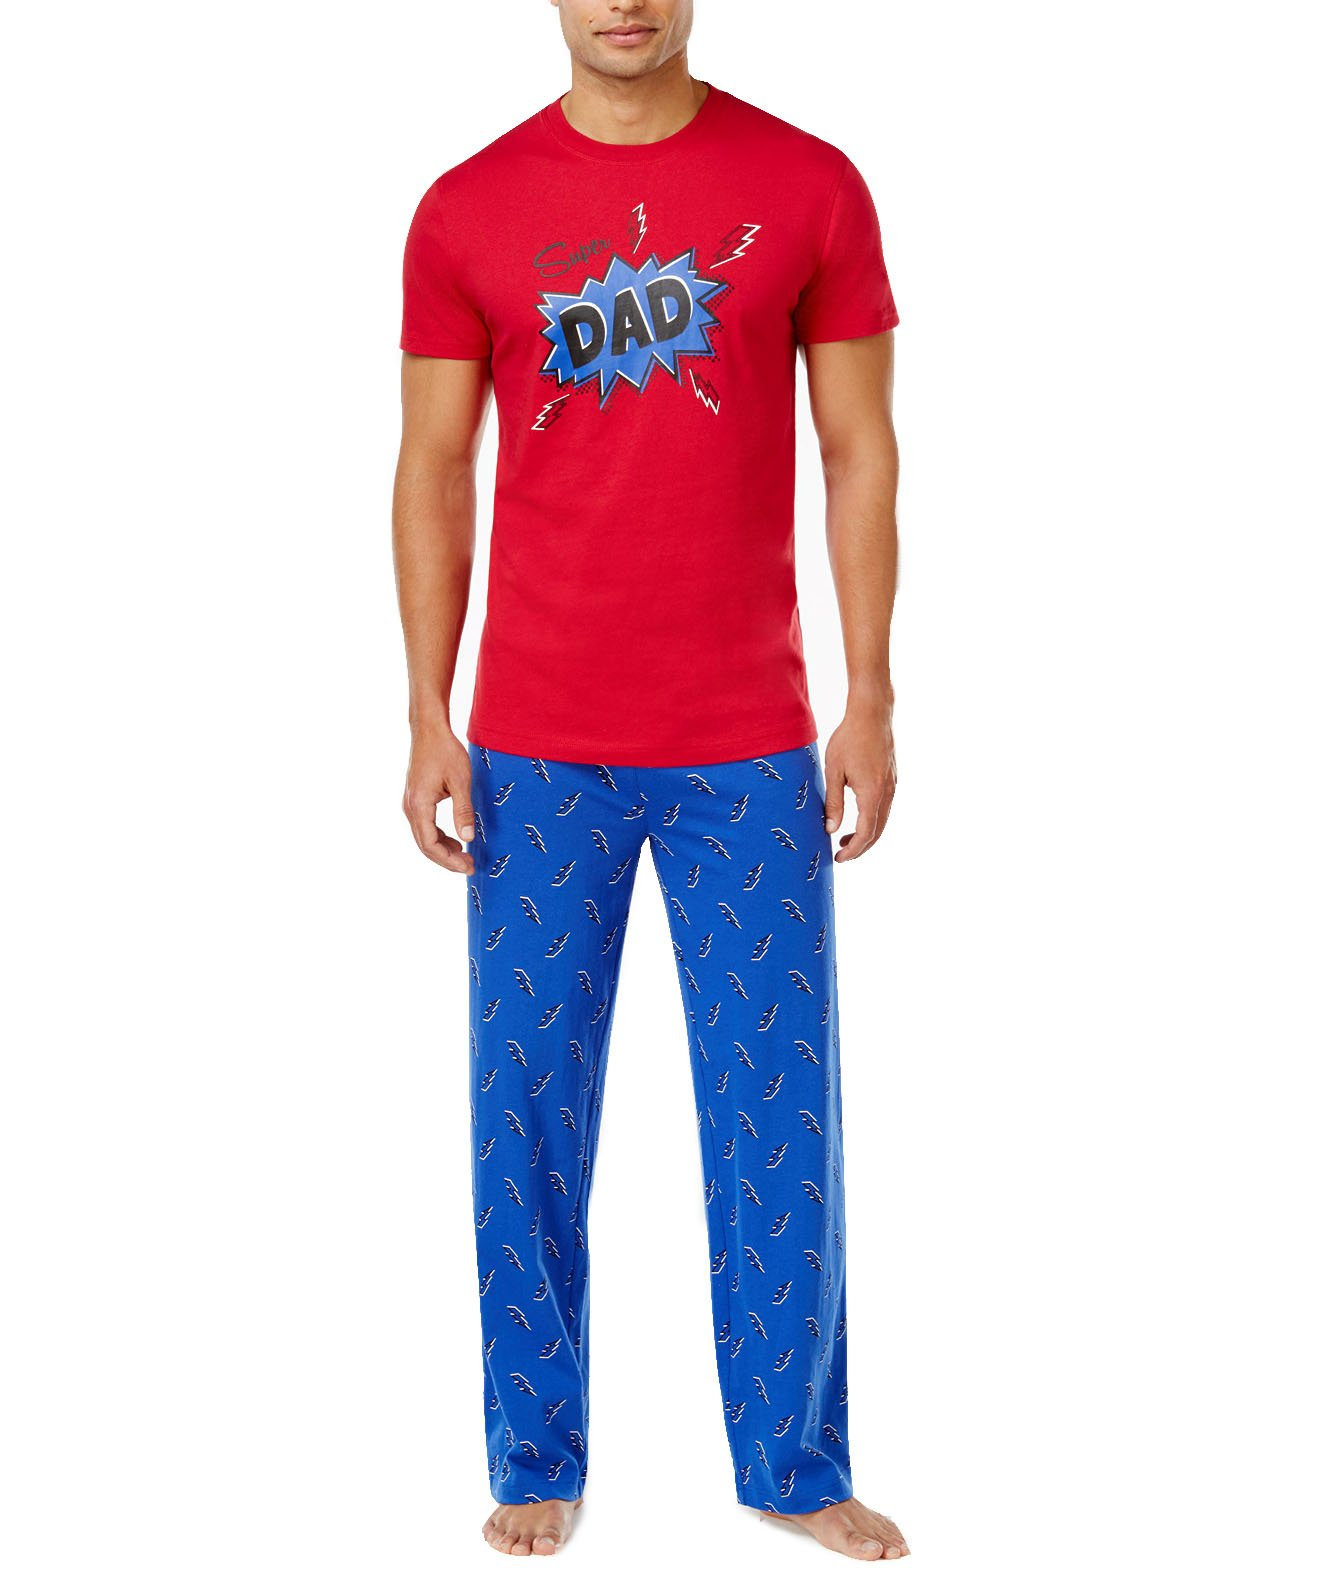 Family Pajamas Men's Super Dad Pajama Set (Large, Thunder Bolts)